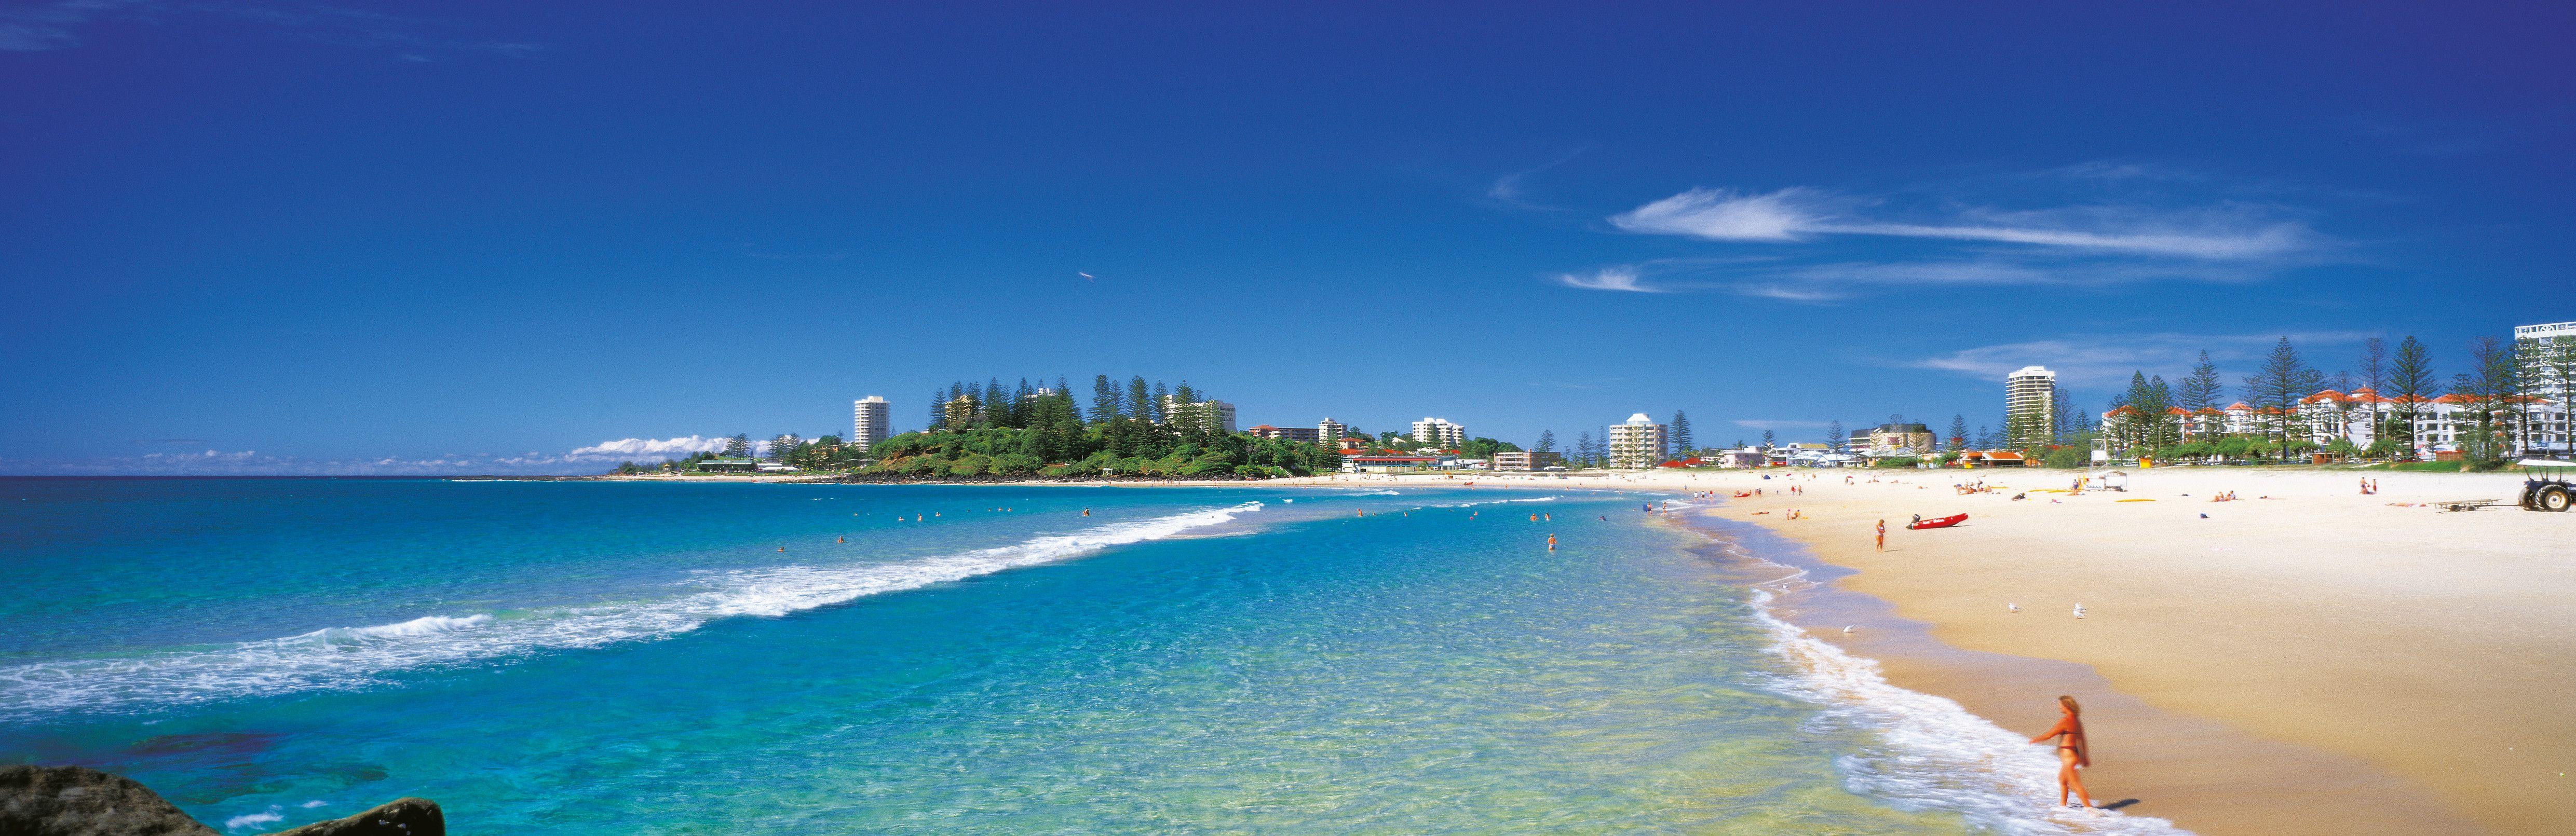 to Queensland, Australia Beach scenery, Beach